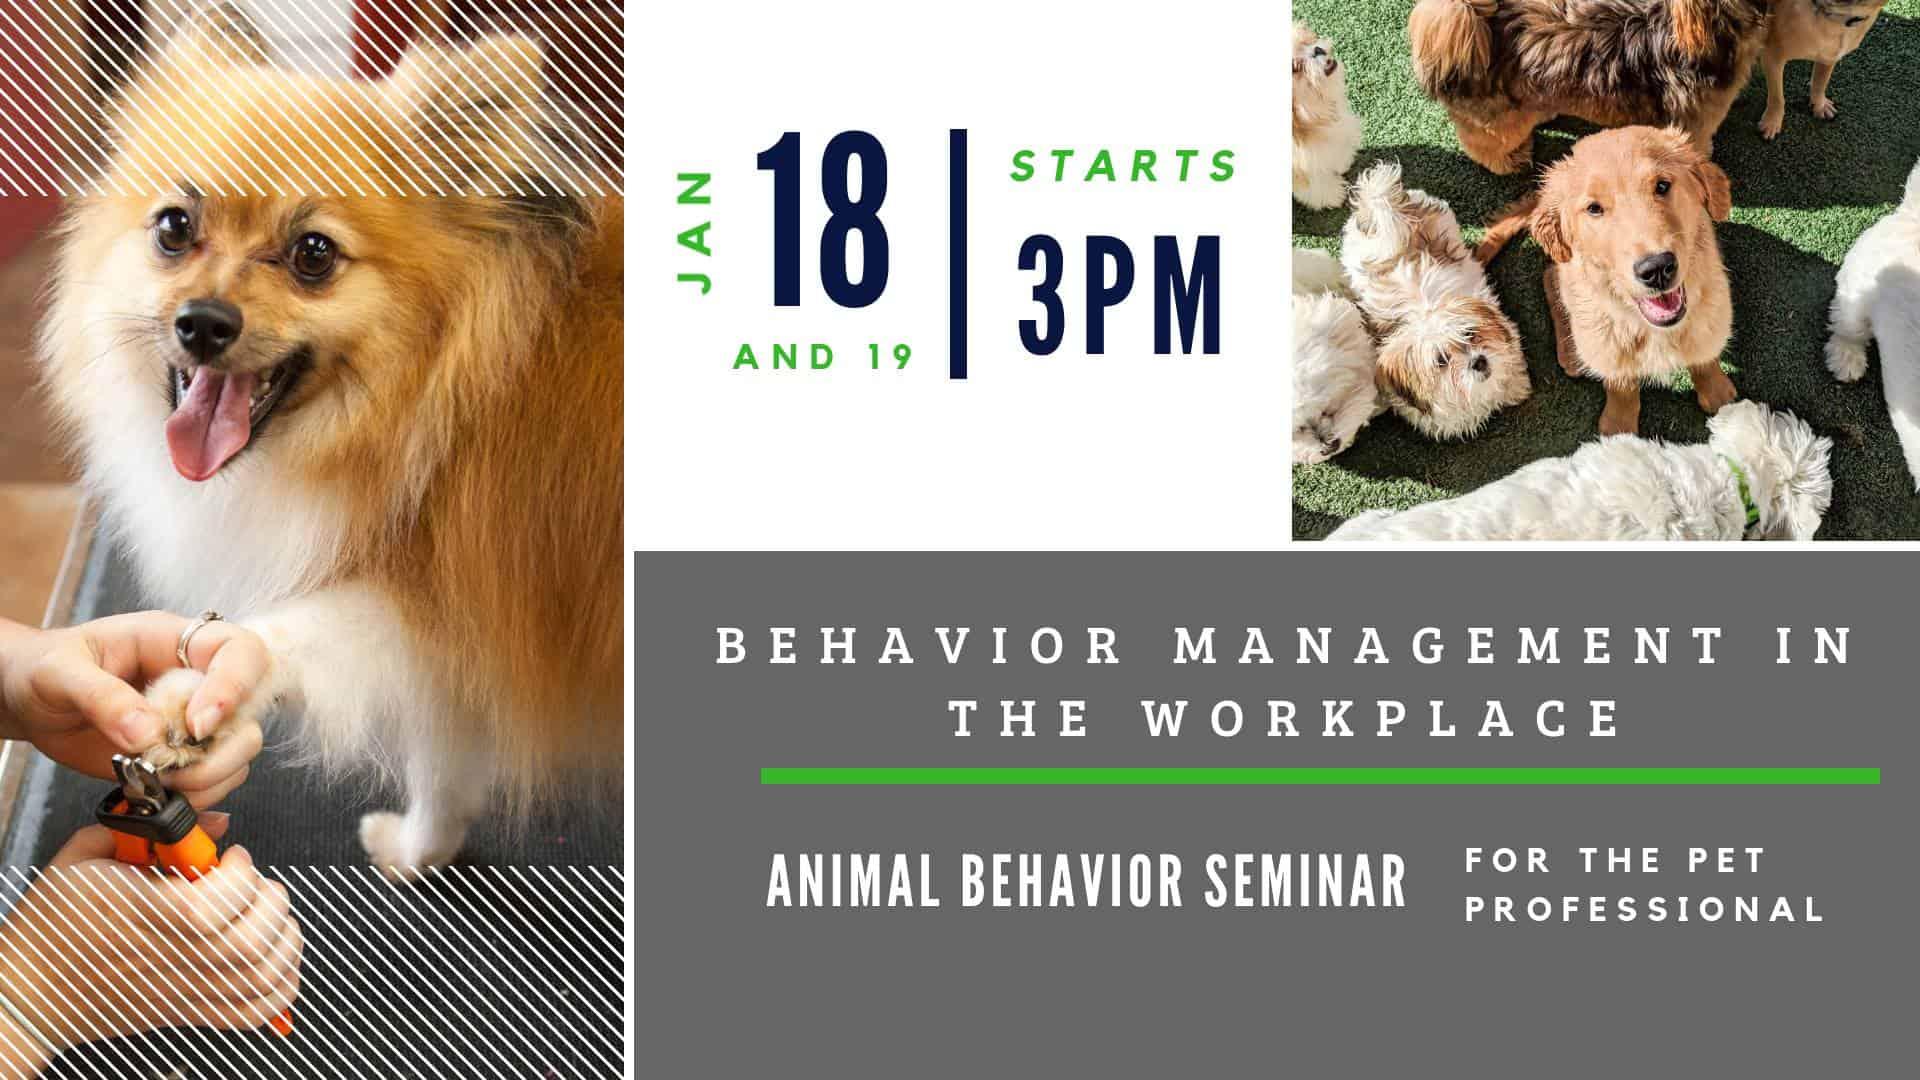 Behavior Management In The Workplace Seminar